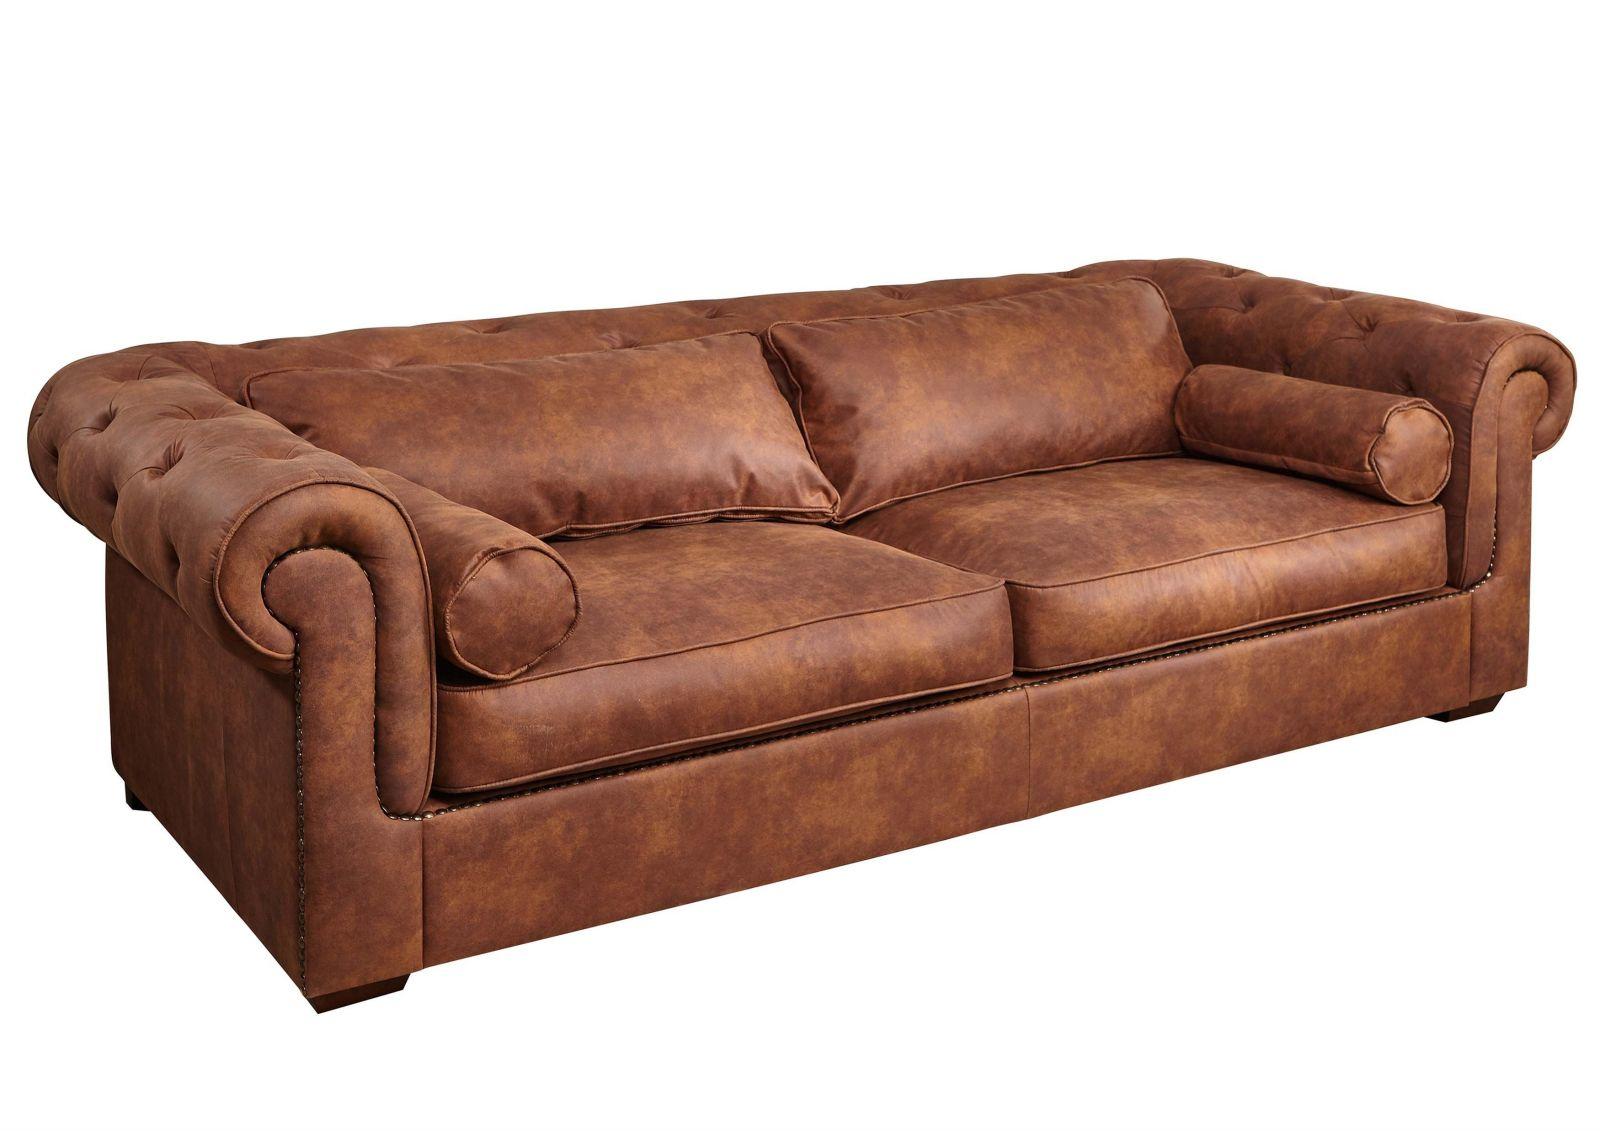 Full Size of Sofa 240x115x77 Cognac Windsor 106 Mondo Home Affair Grünes Creme Garnitur Barock Leinen 3 Sitzer Mit Relaxfunktion überzug Chesterfield Grau 3er Poco Big Sofa Sofa Cognac